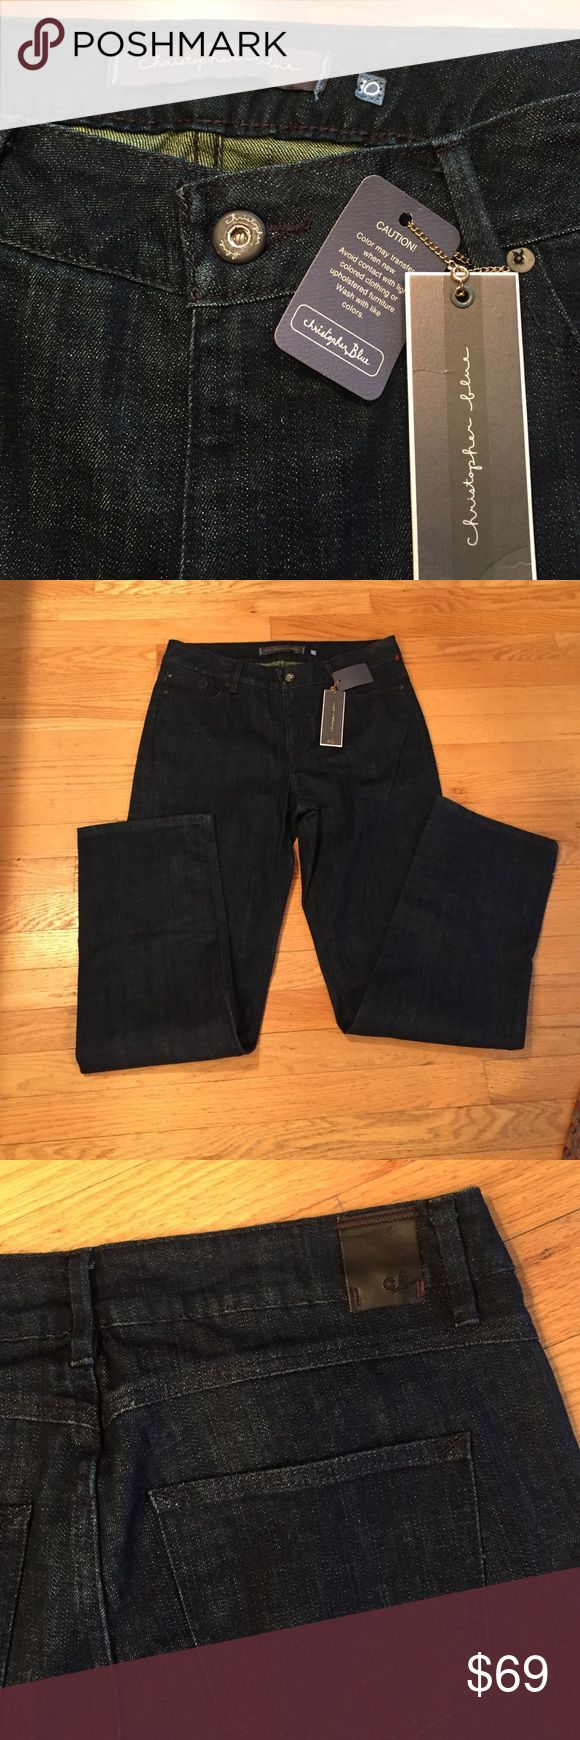 Brand New Juku Christopher Blue Jeans Juku Highest rise in deep dark blue. Chrisopher Blue Jeans